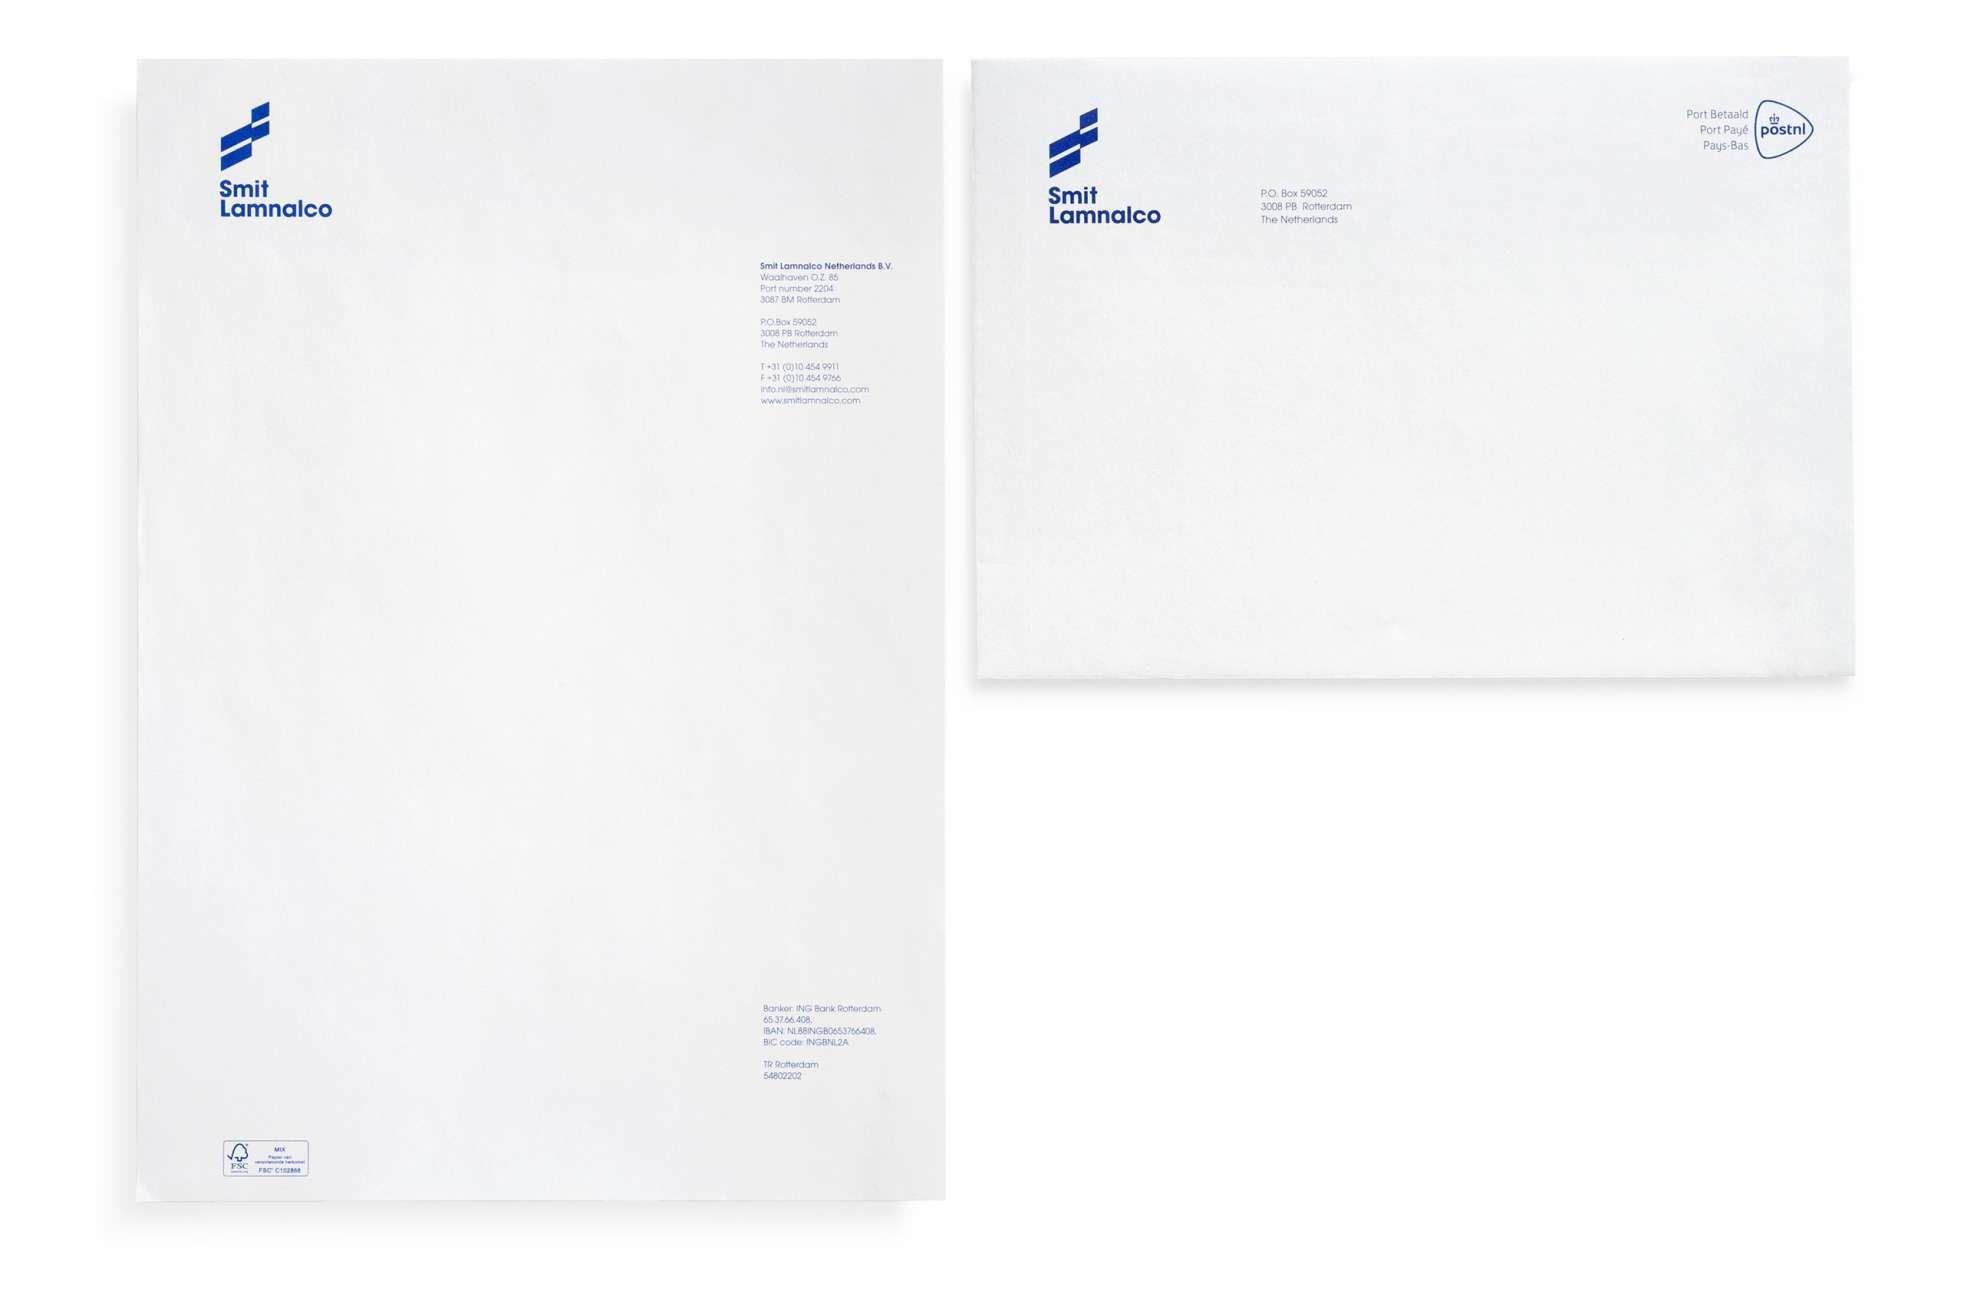 Studio Dumbar Smit Lamnalco Visual Identity Branding Visual Identity Identity Design Identity